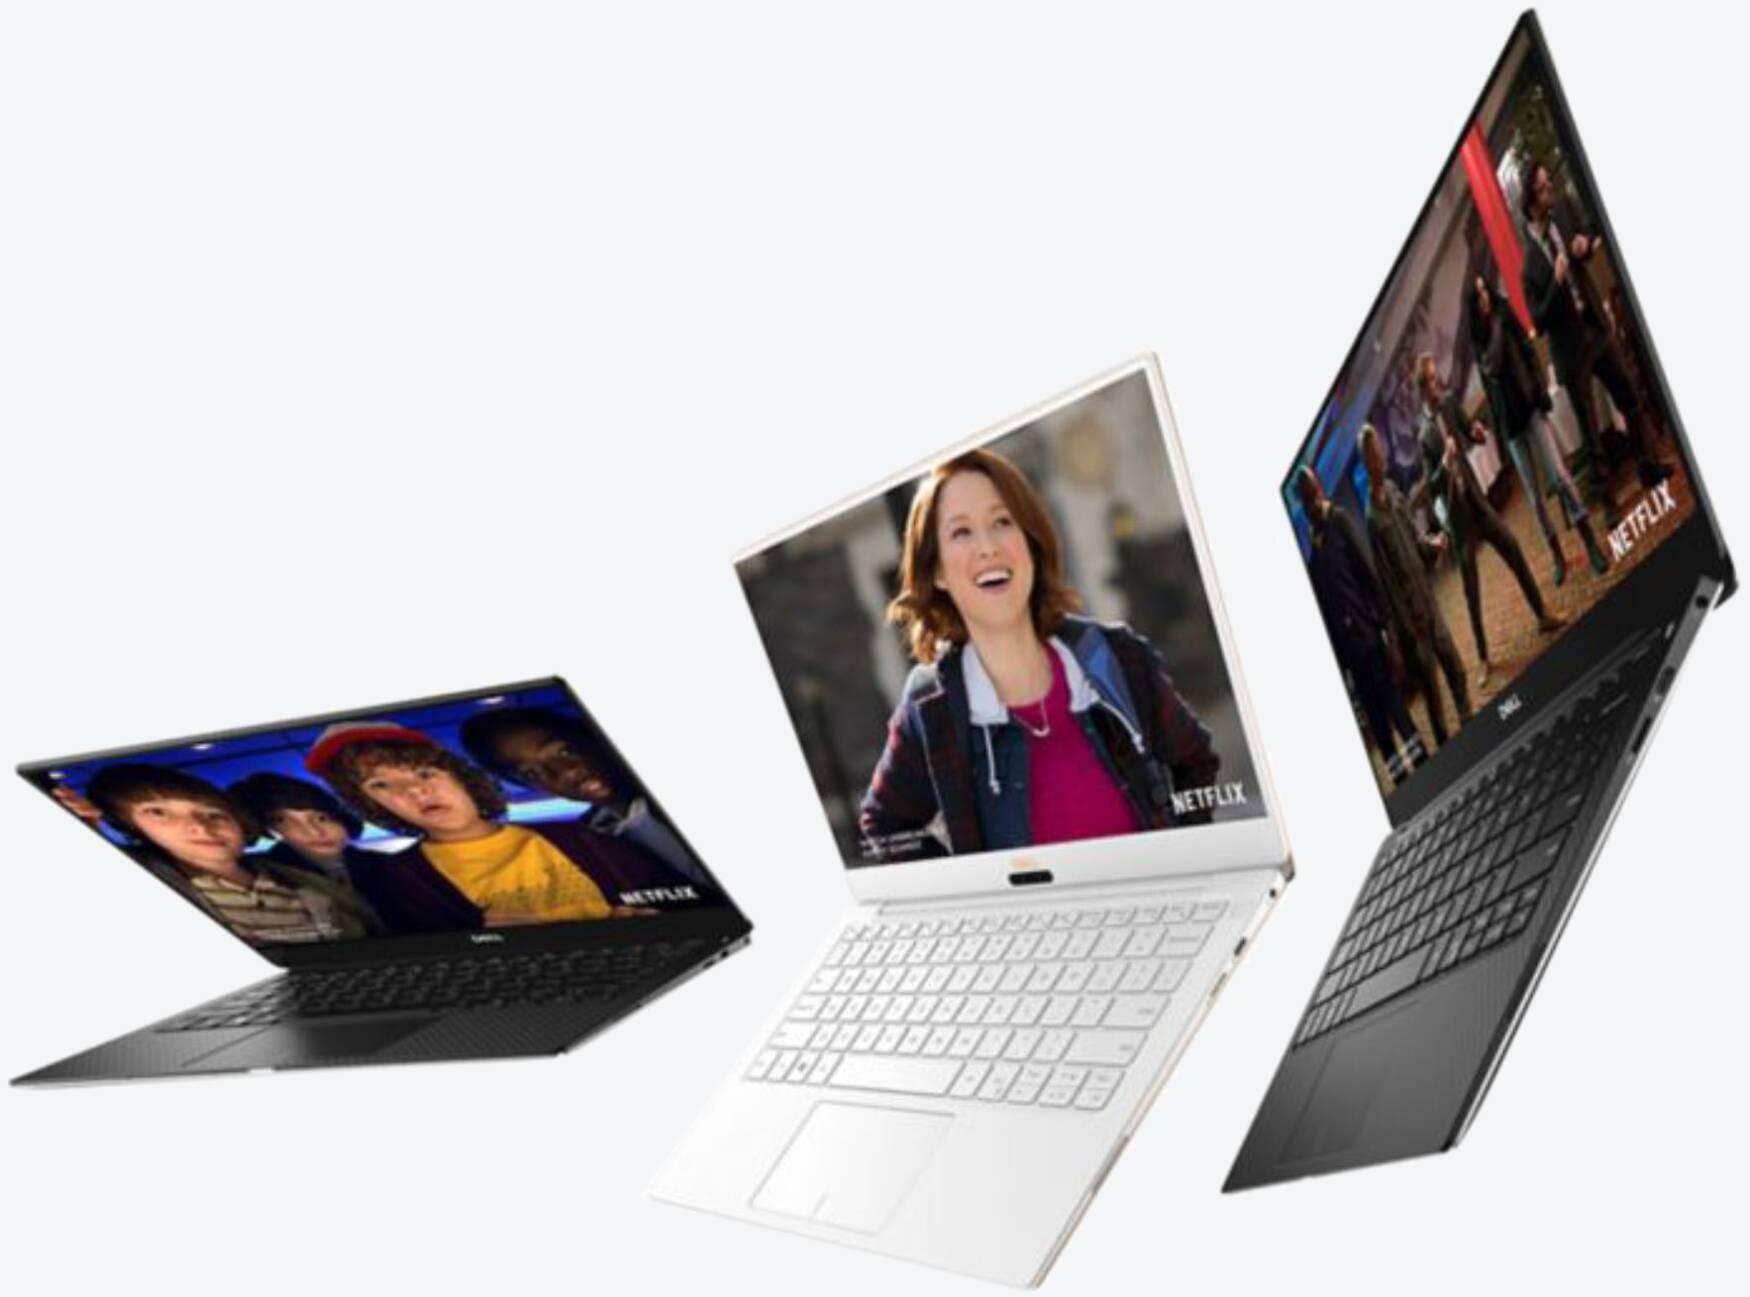 Dell XPS 13 (2018) 4K Touch 9370-CRGRM